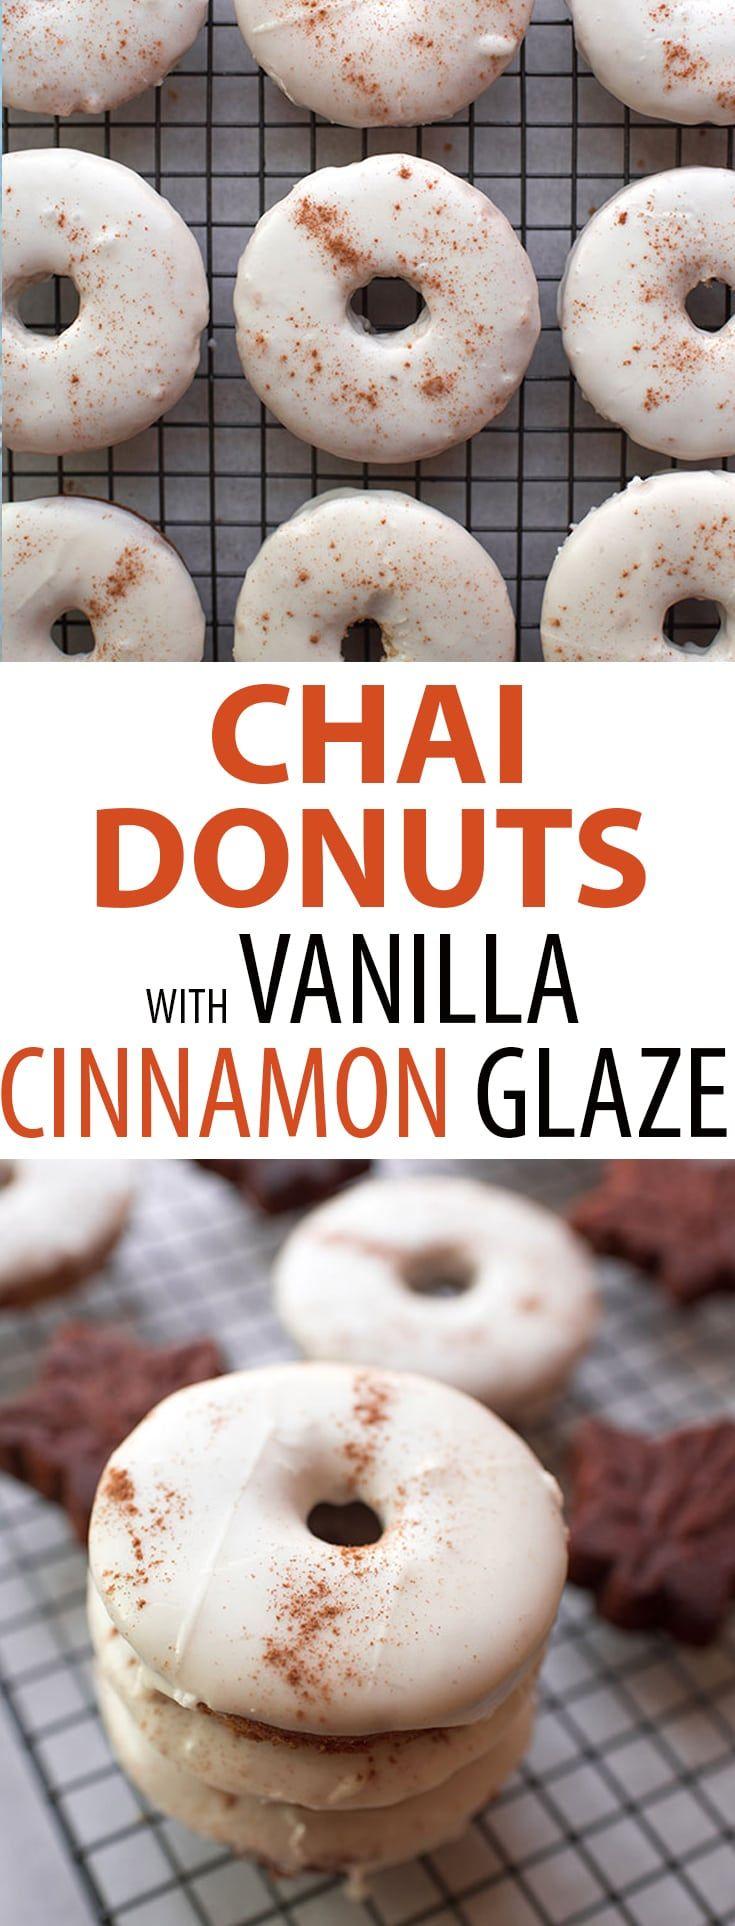 Chai baked donuts with vanilla cinnamon glaze cake